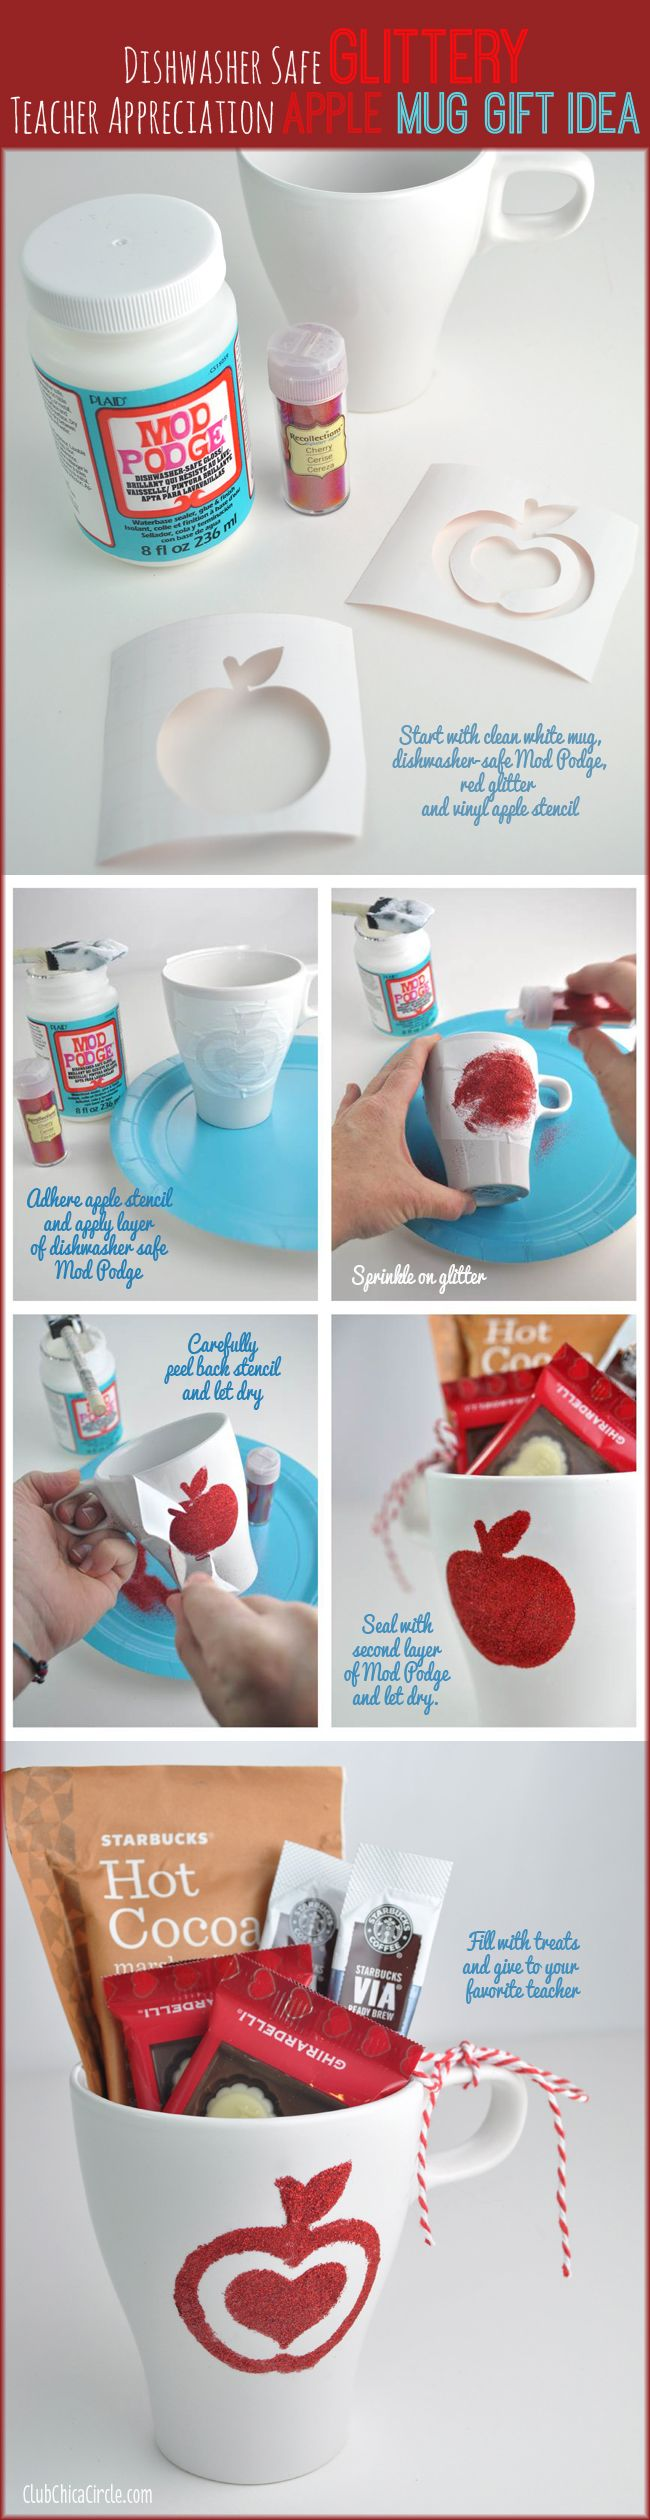 Dishwasher Safe Glittery Mod Podge Teacher Appreciation Mug Gift Idea and Craft